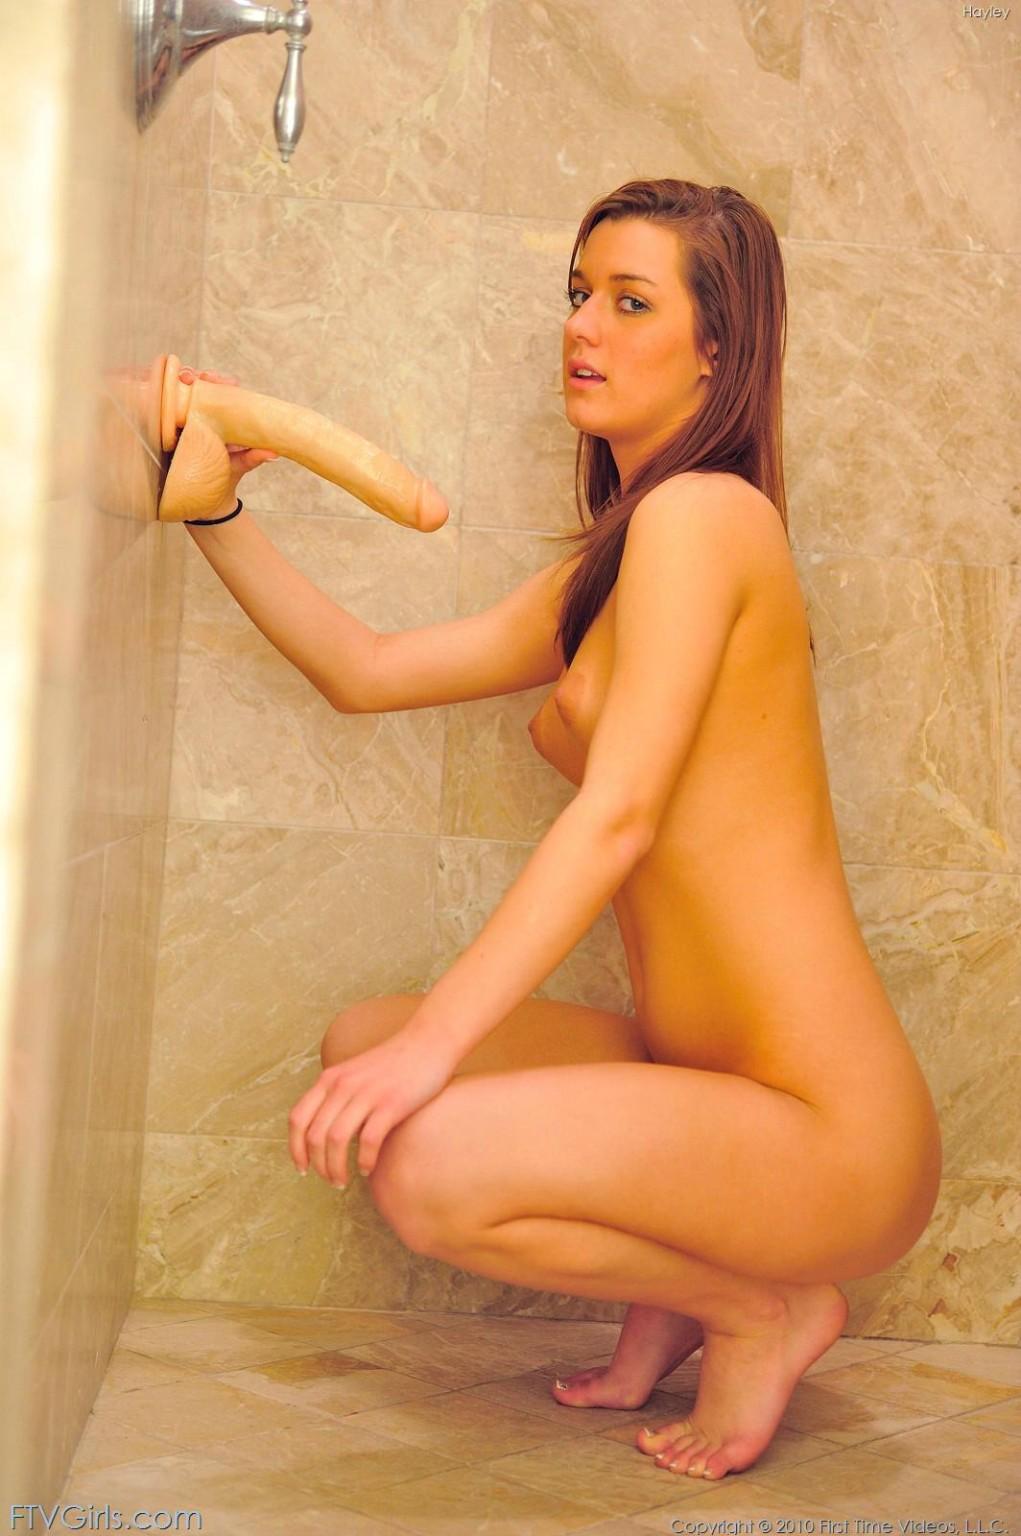 Nude Dildos Dildo